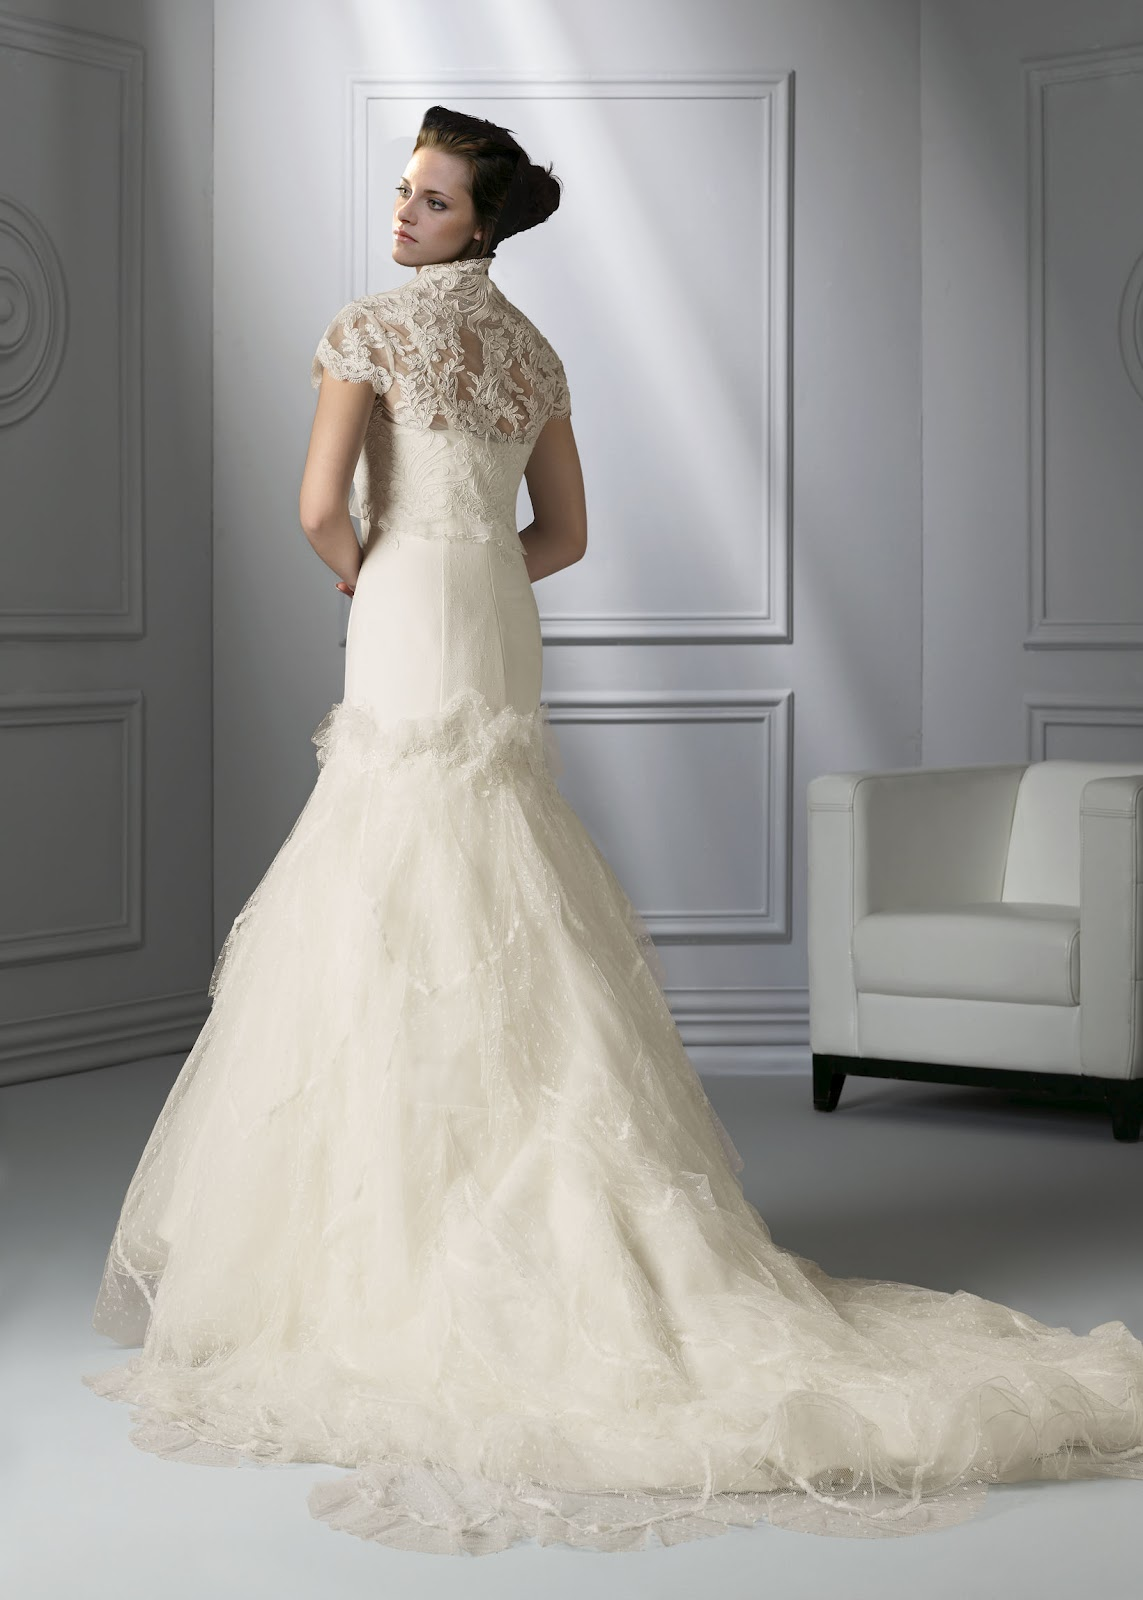 bella wedding dress-Knitting Gallery